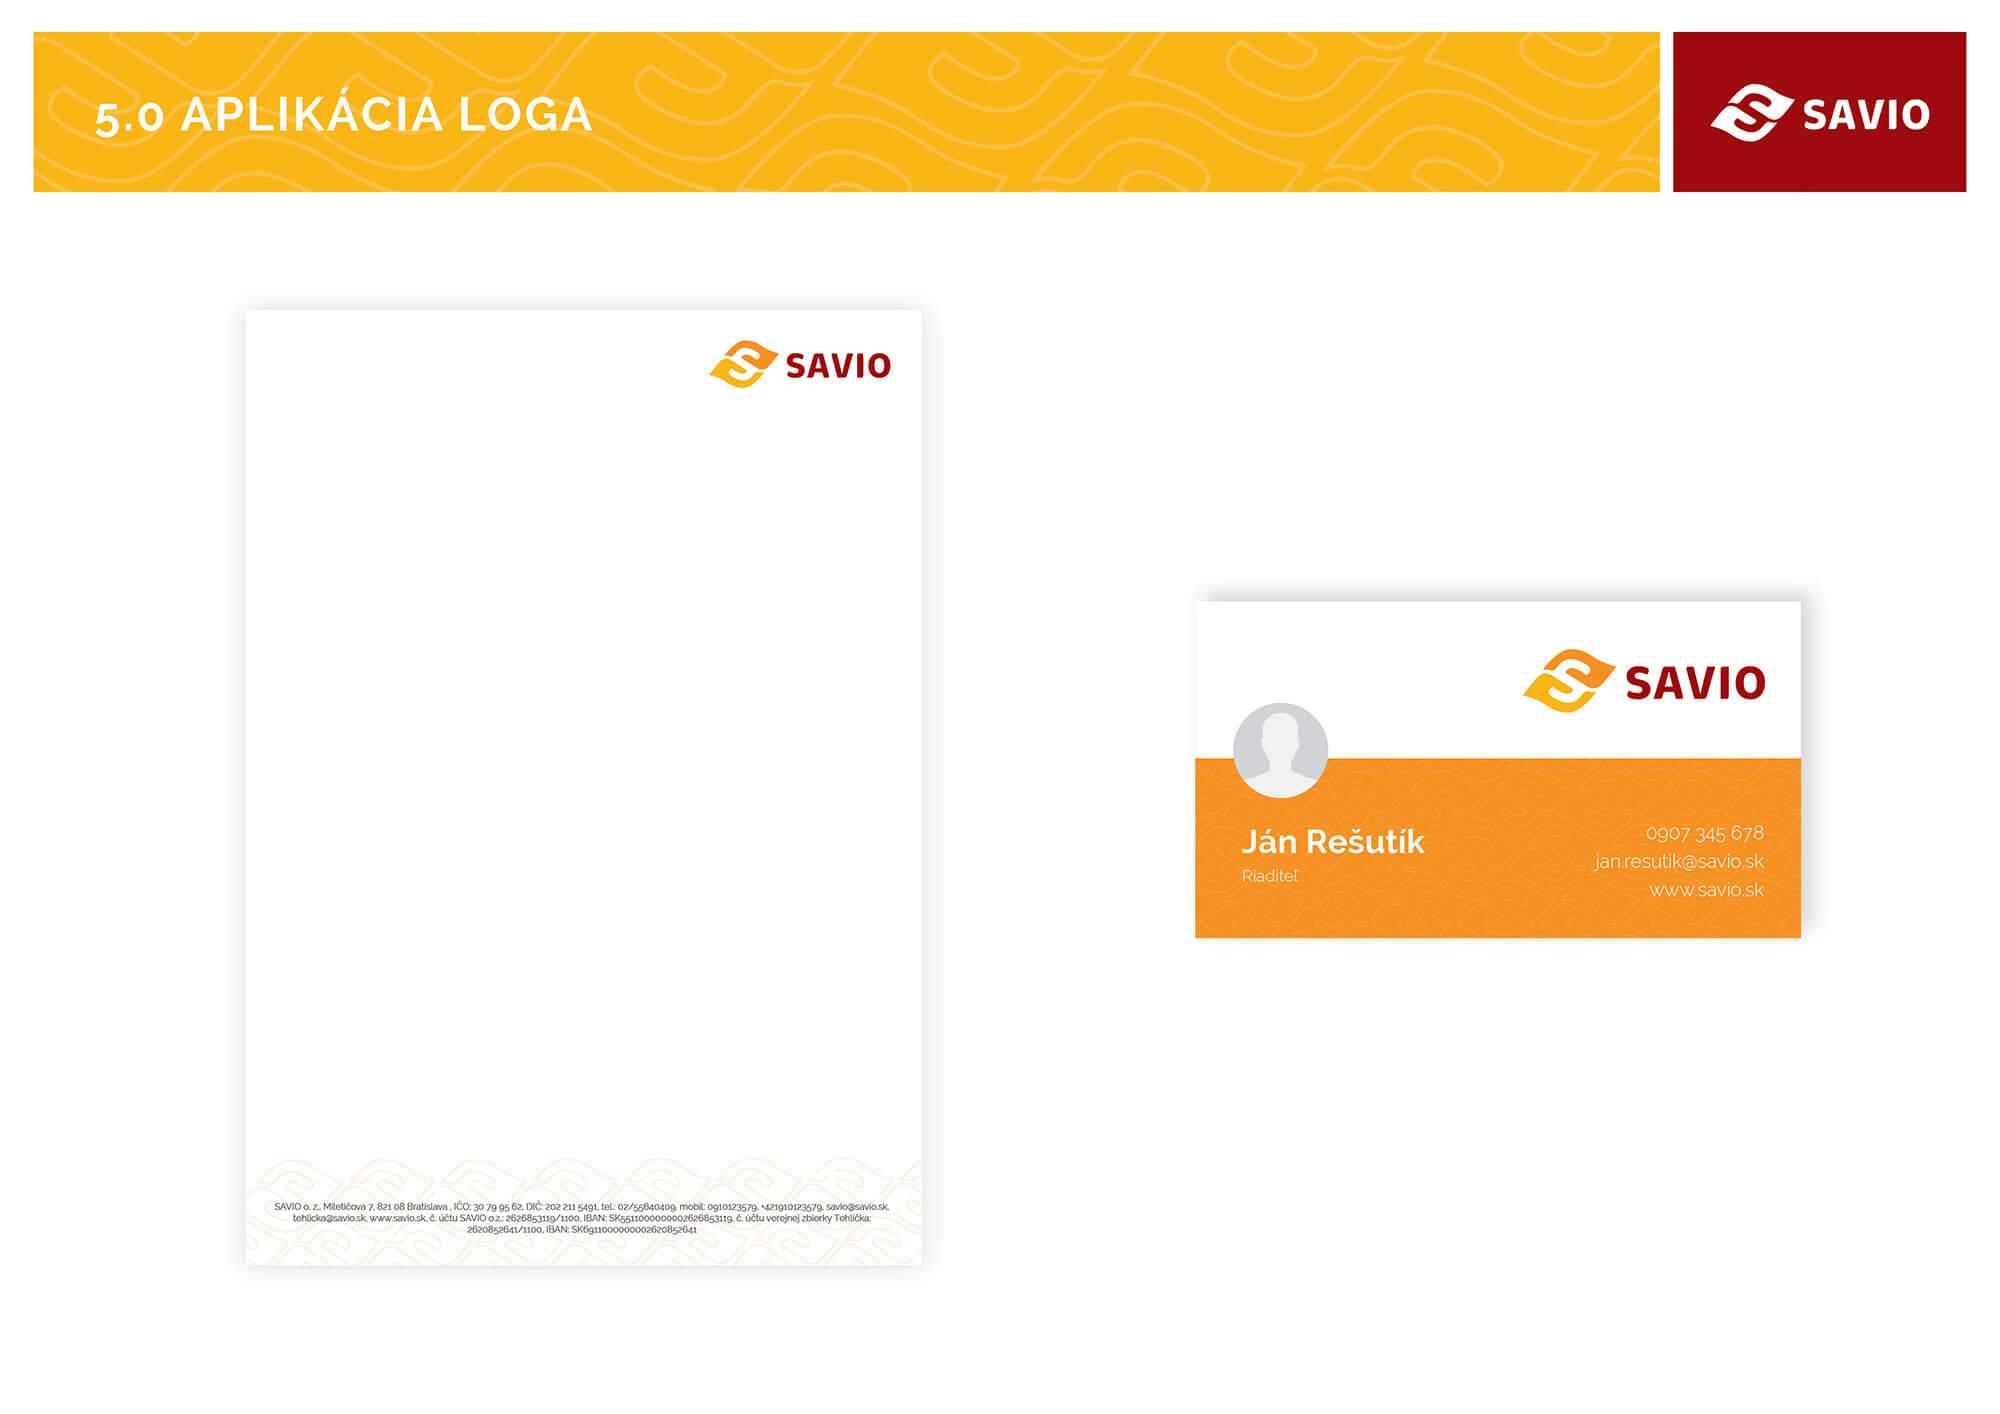 SAV-04-Strategia-CI-web-design-manual-v0211